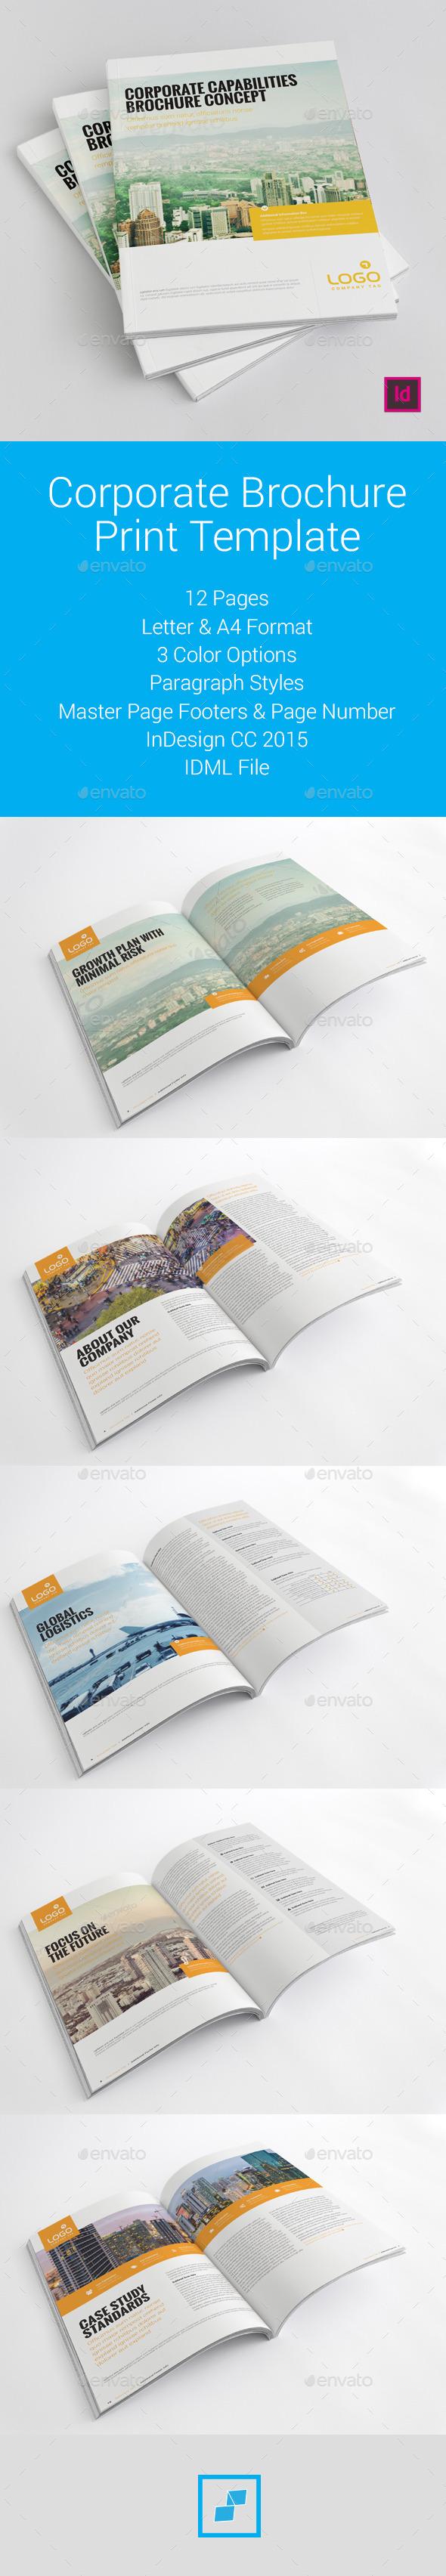 Corporate Brochure Print Template - Corporate Brochures